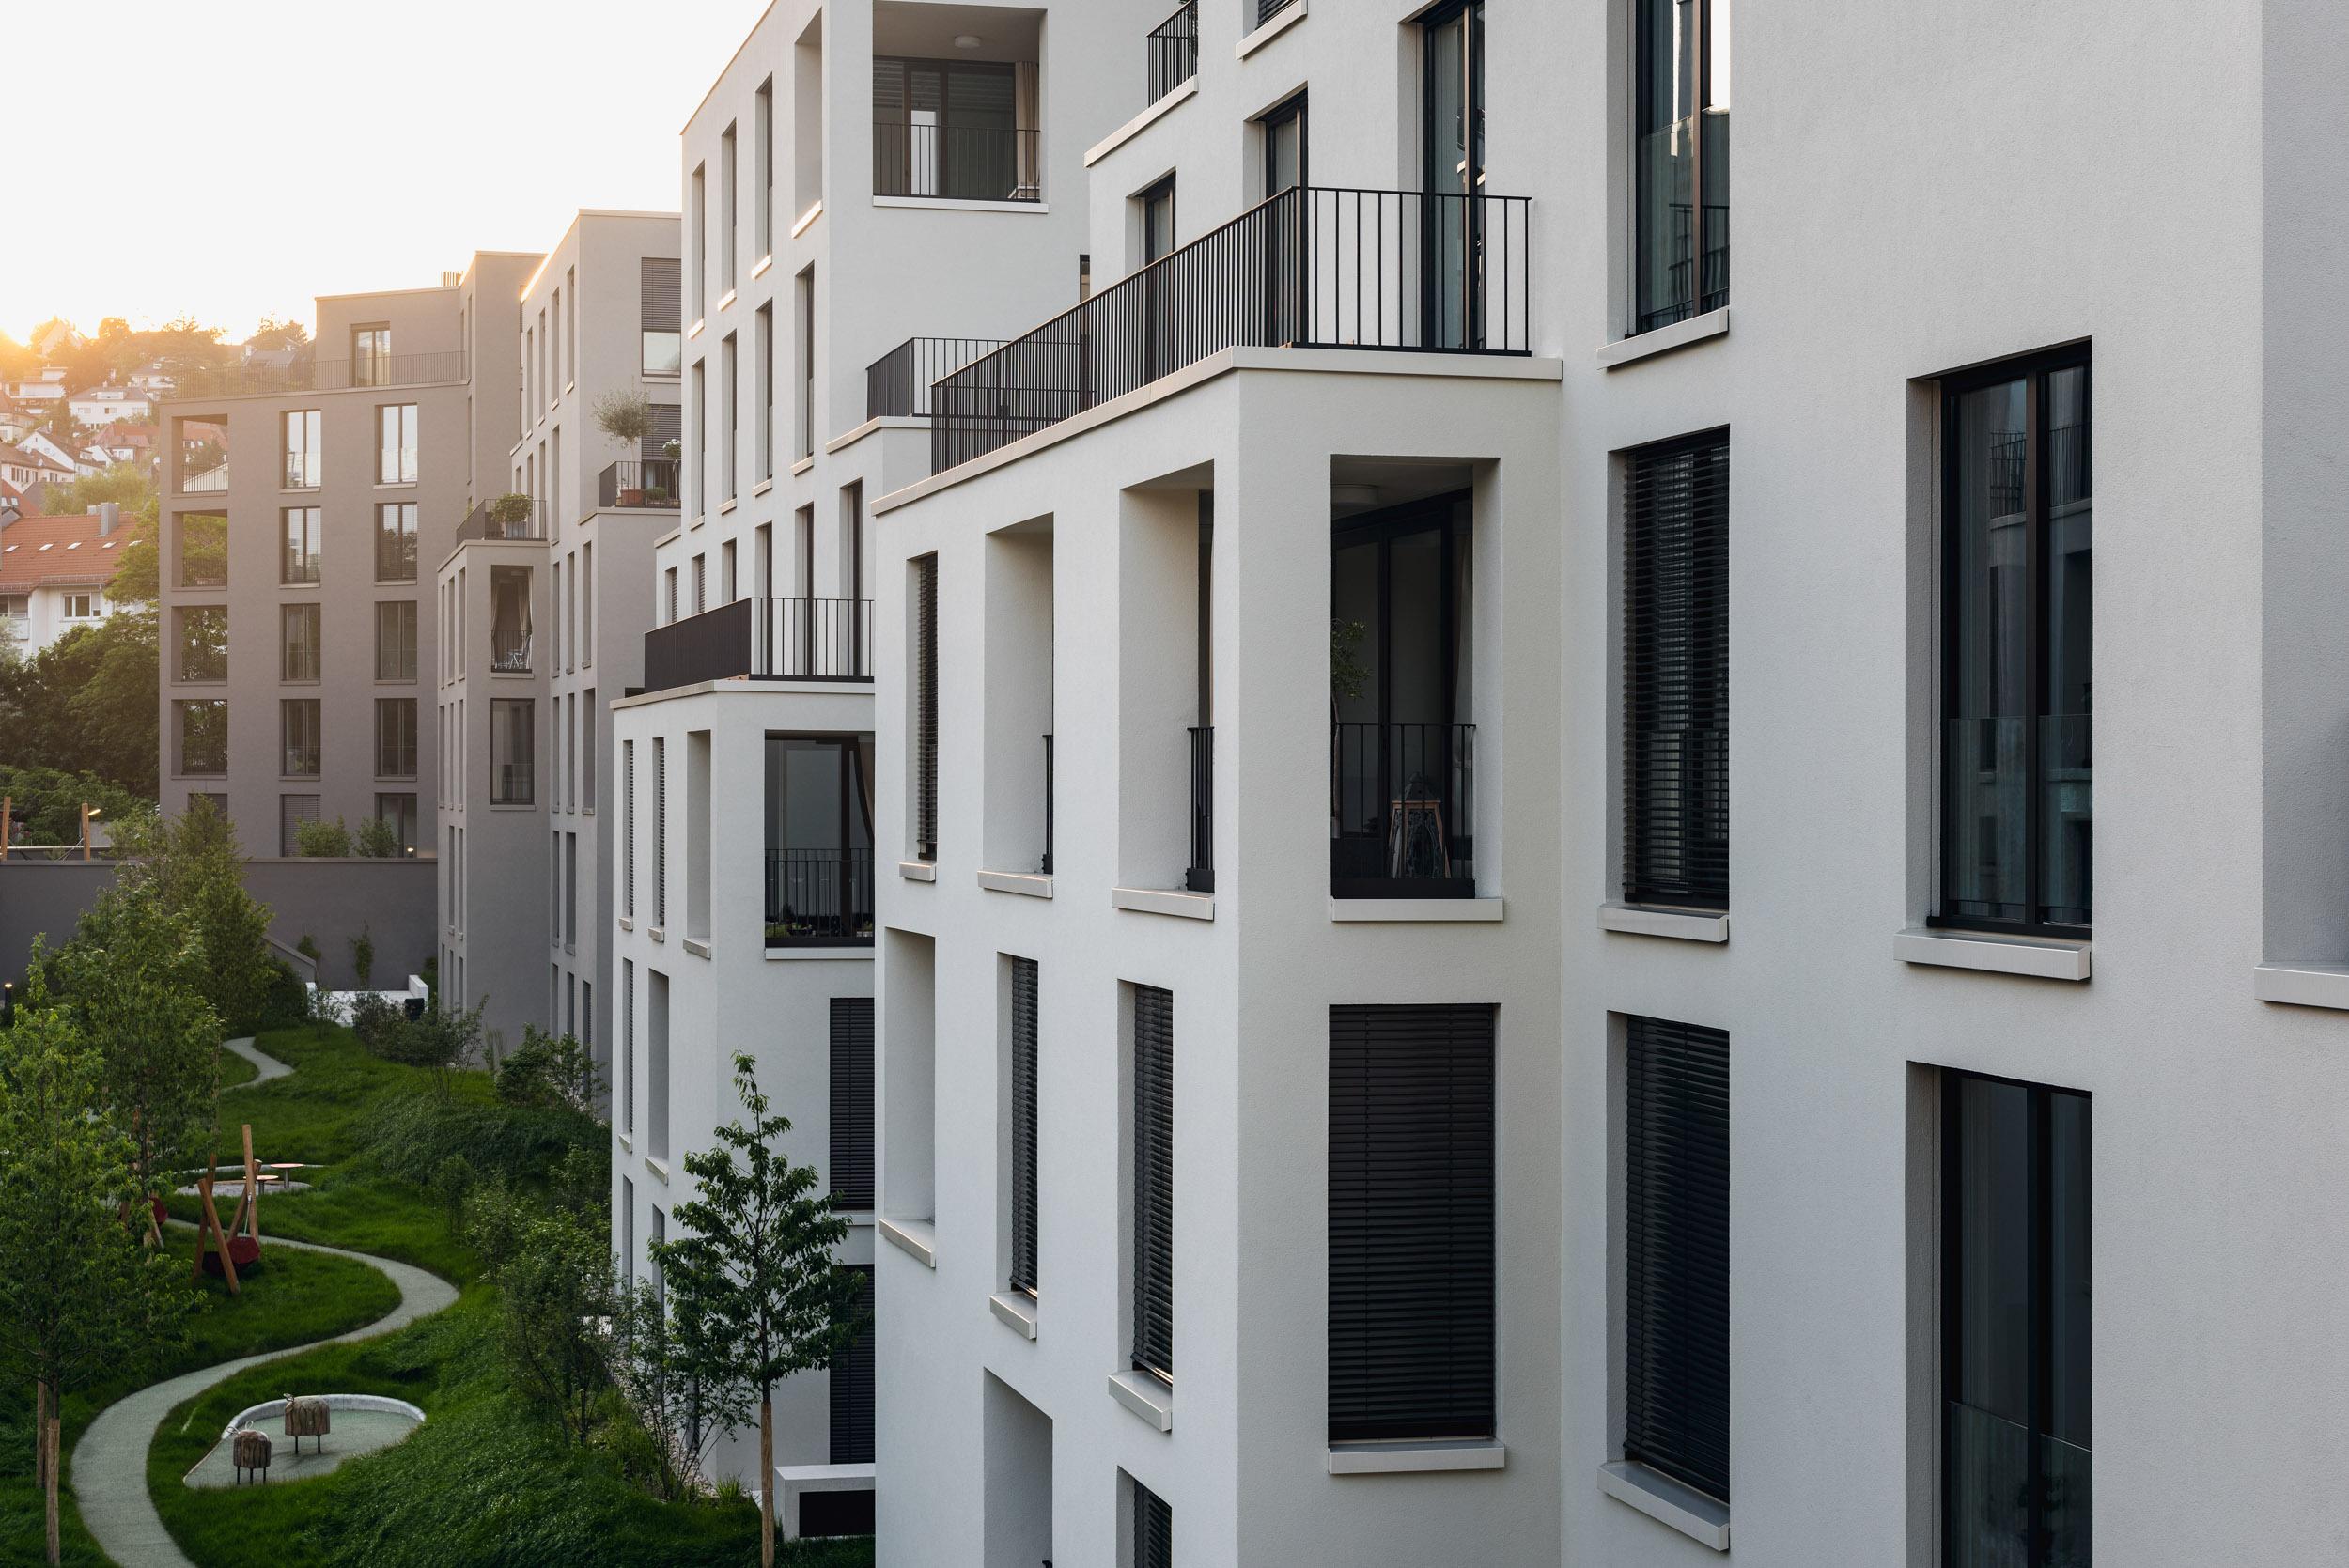 Gustav-Epple-Bauunternehmung-Stuttgart-Villengarten-MLX3350